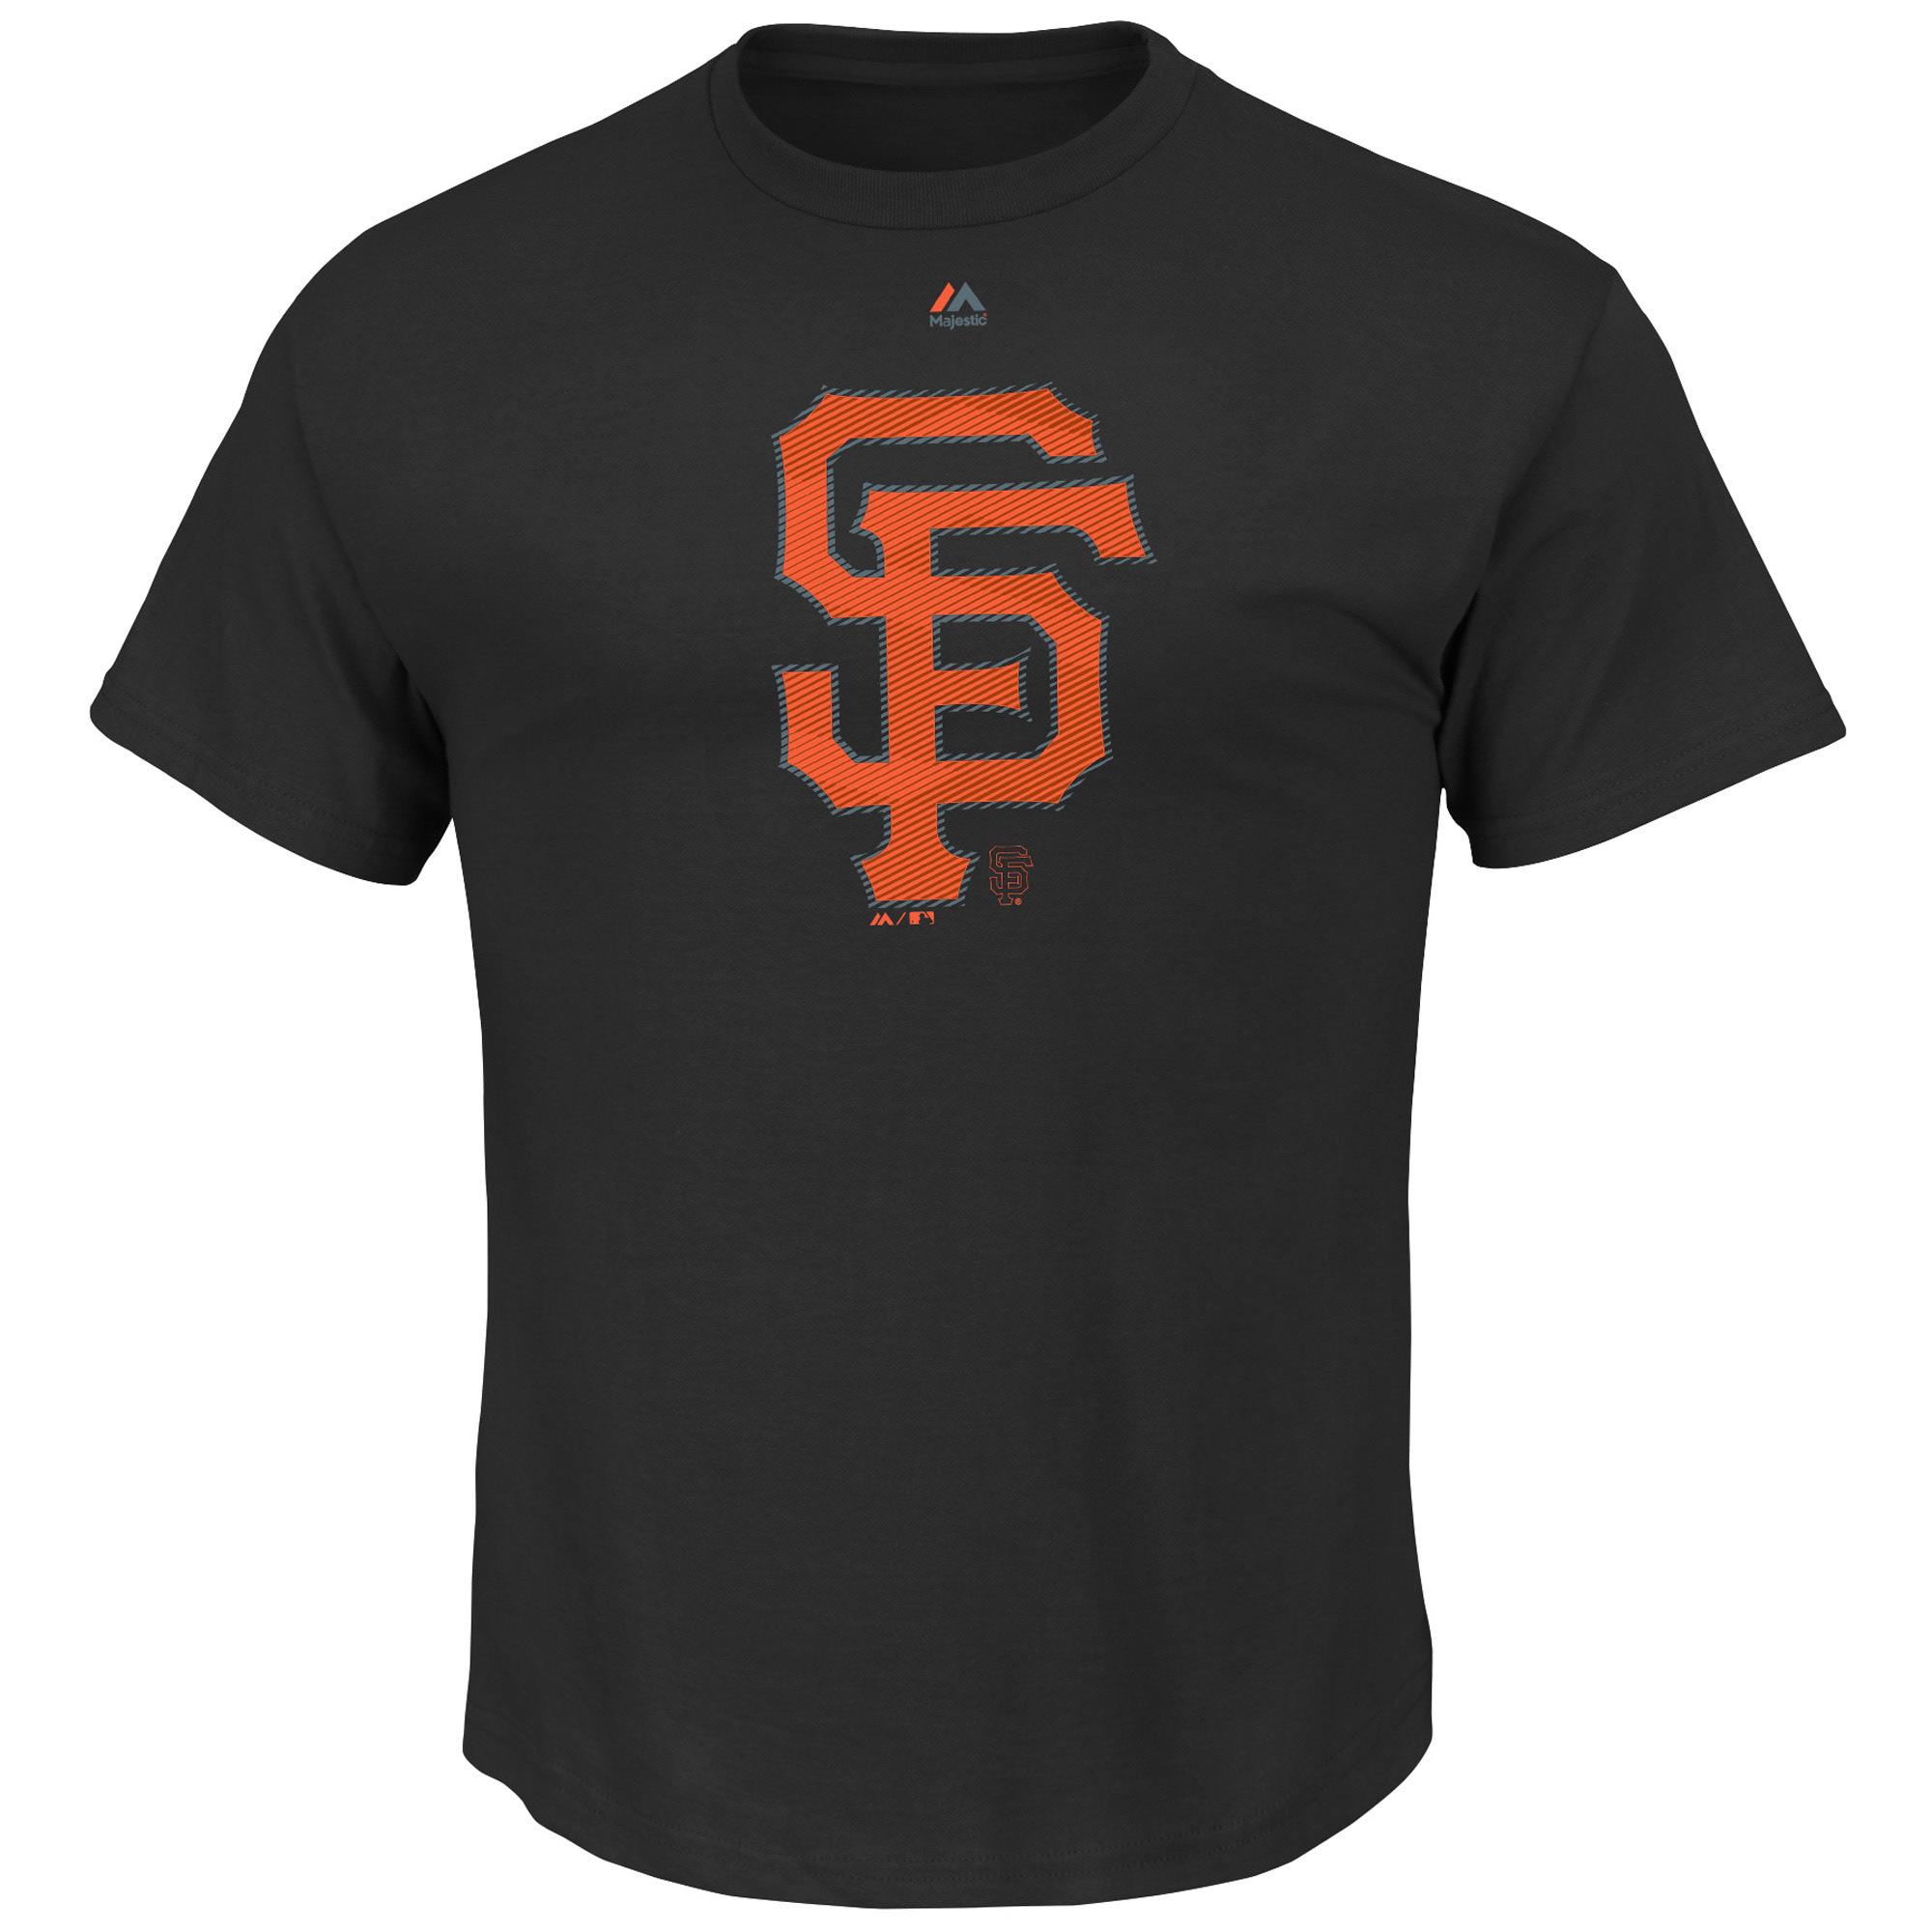 San Francisco Giants Majestic Superior Play T-Shirt - Black